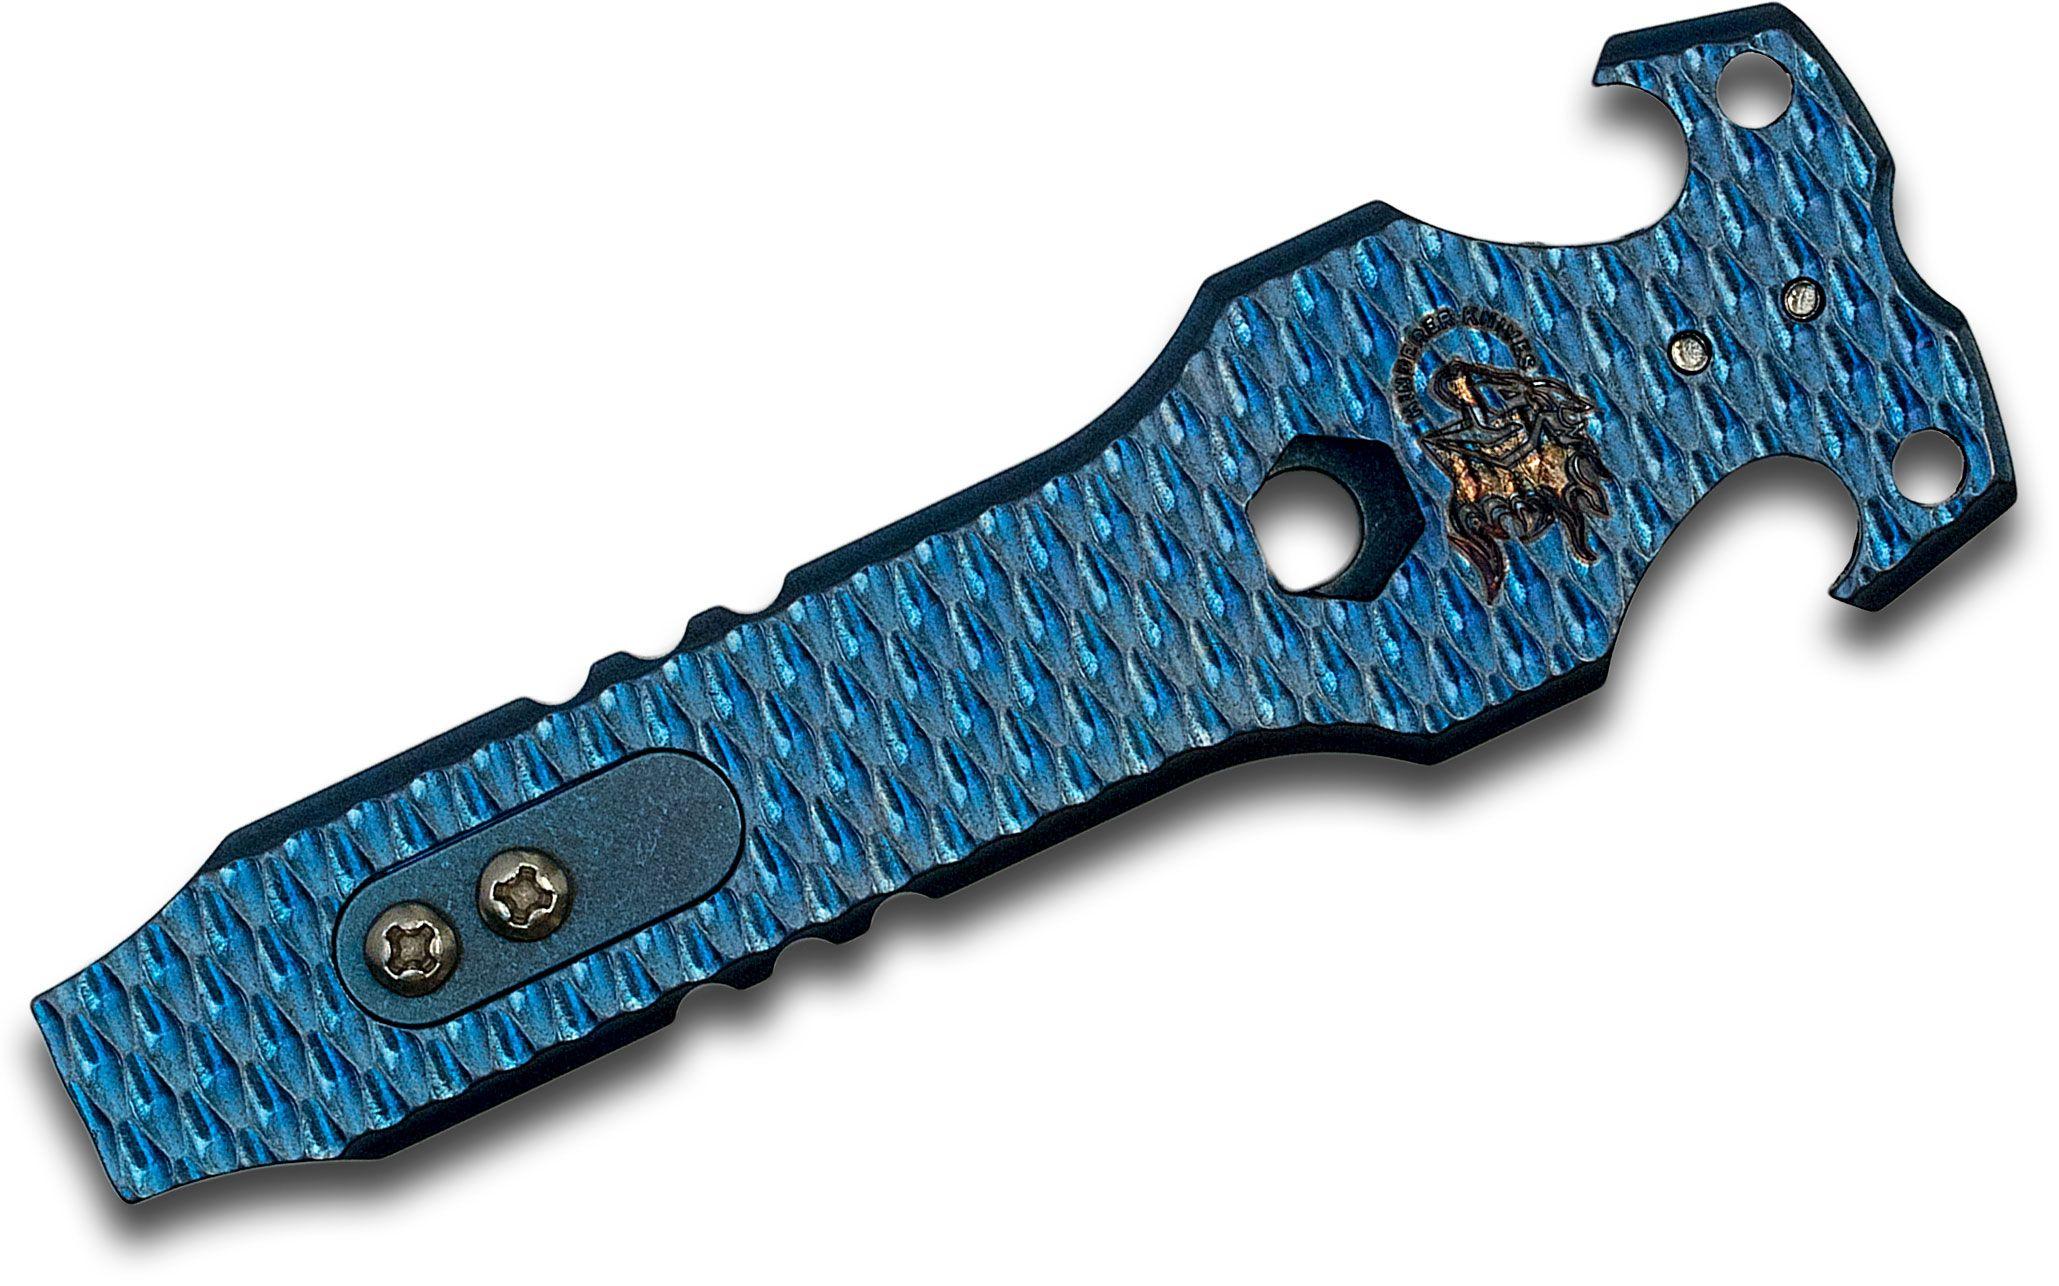 Rick Hinderer Knives Blue Titanium HS-Tac Tool